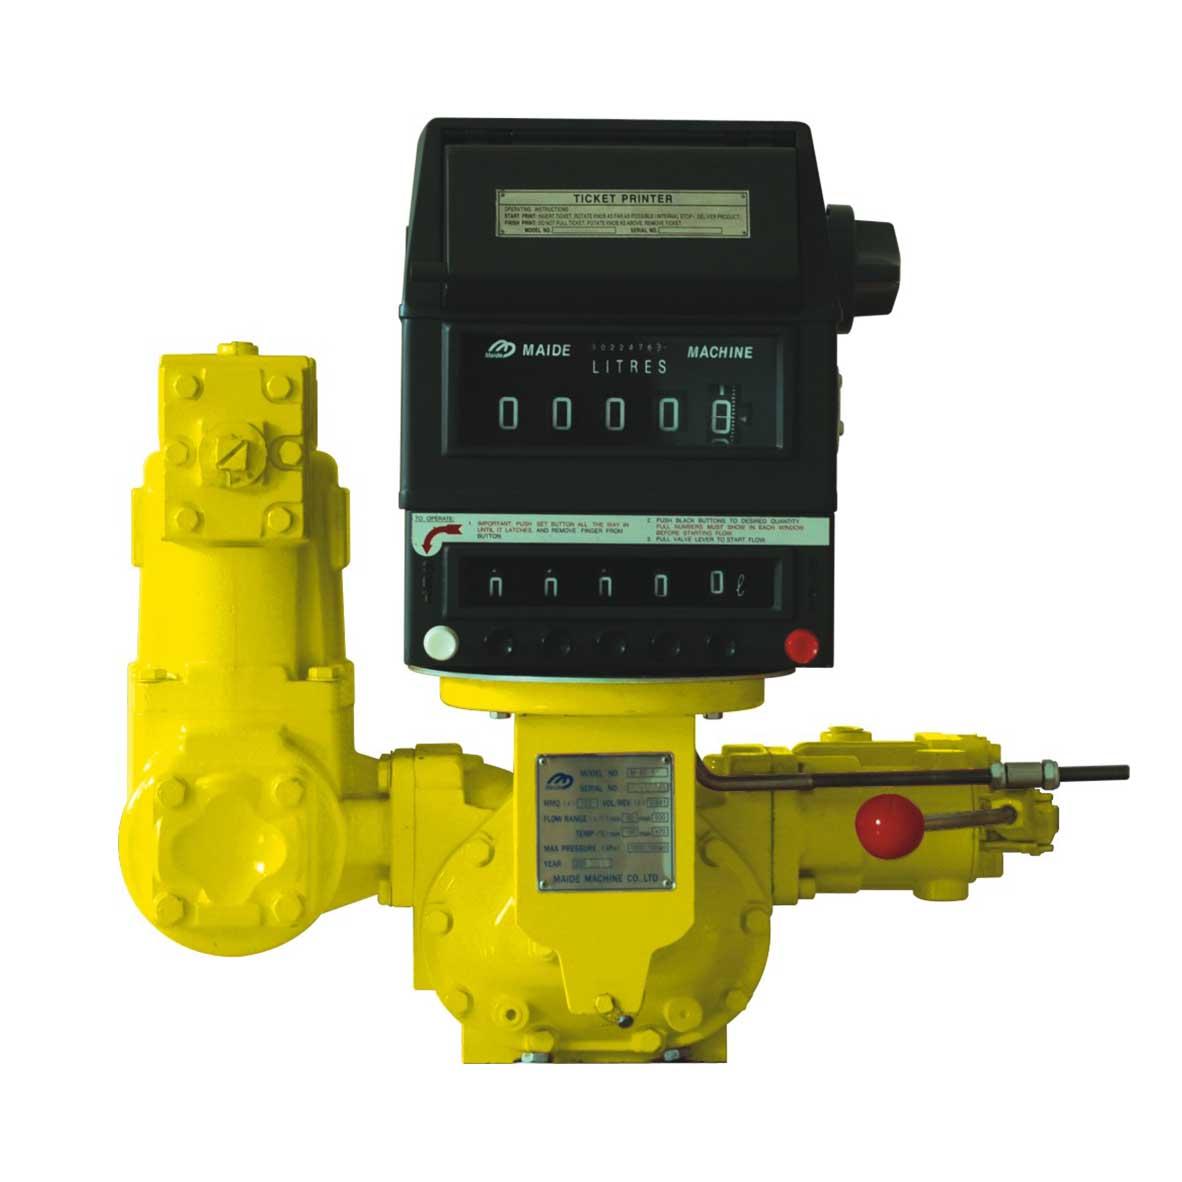 Preset flow meter with printer